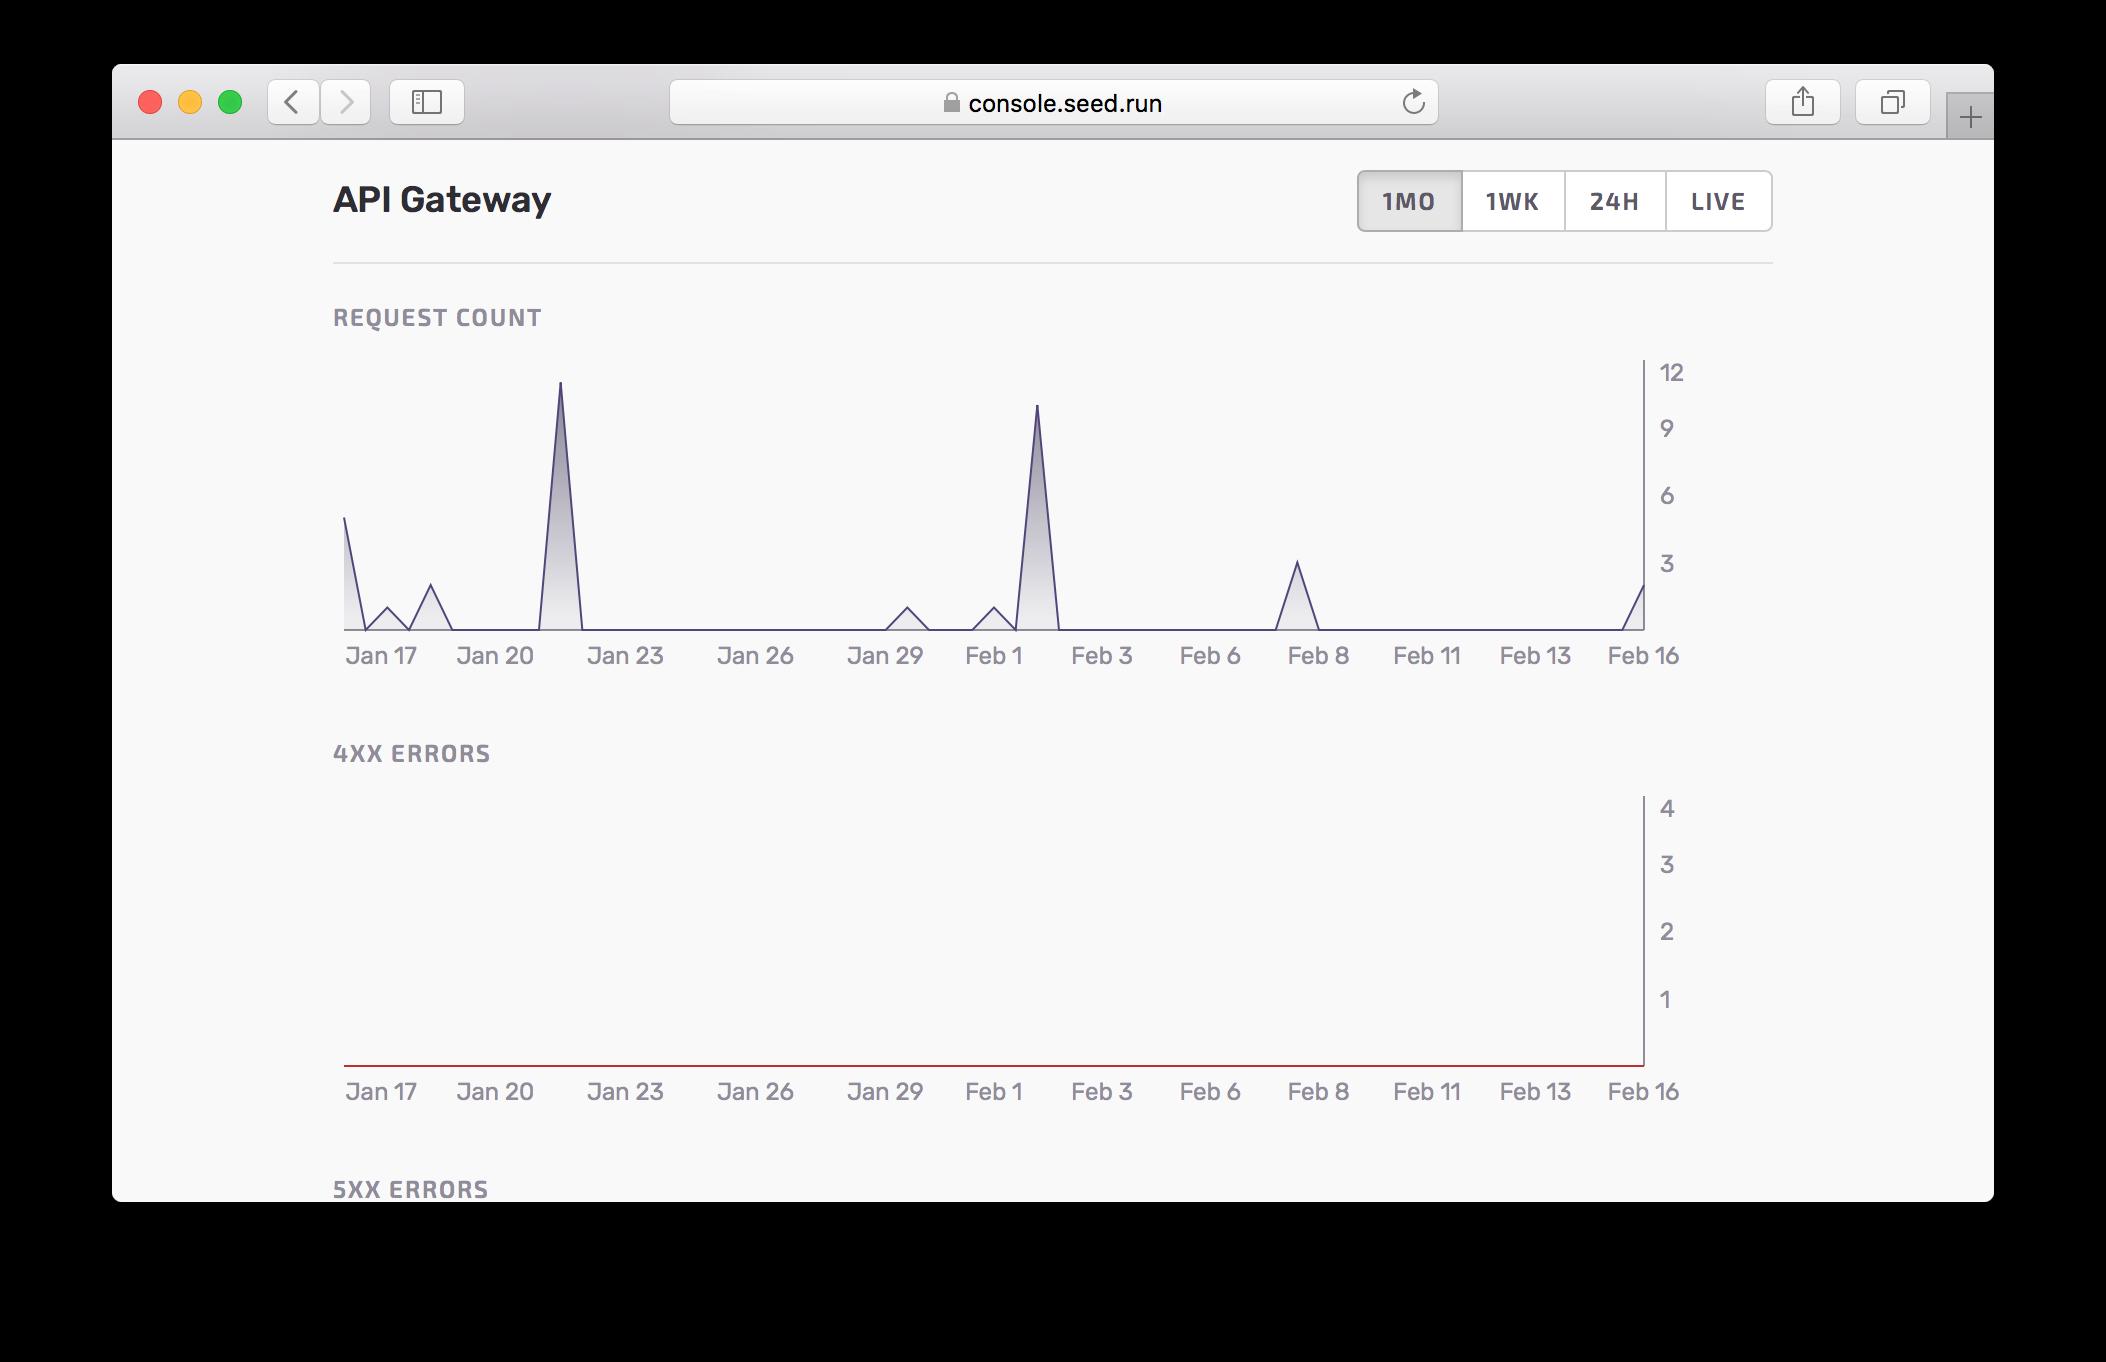 API Gateway Metrics